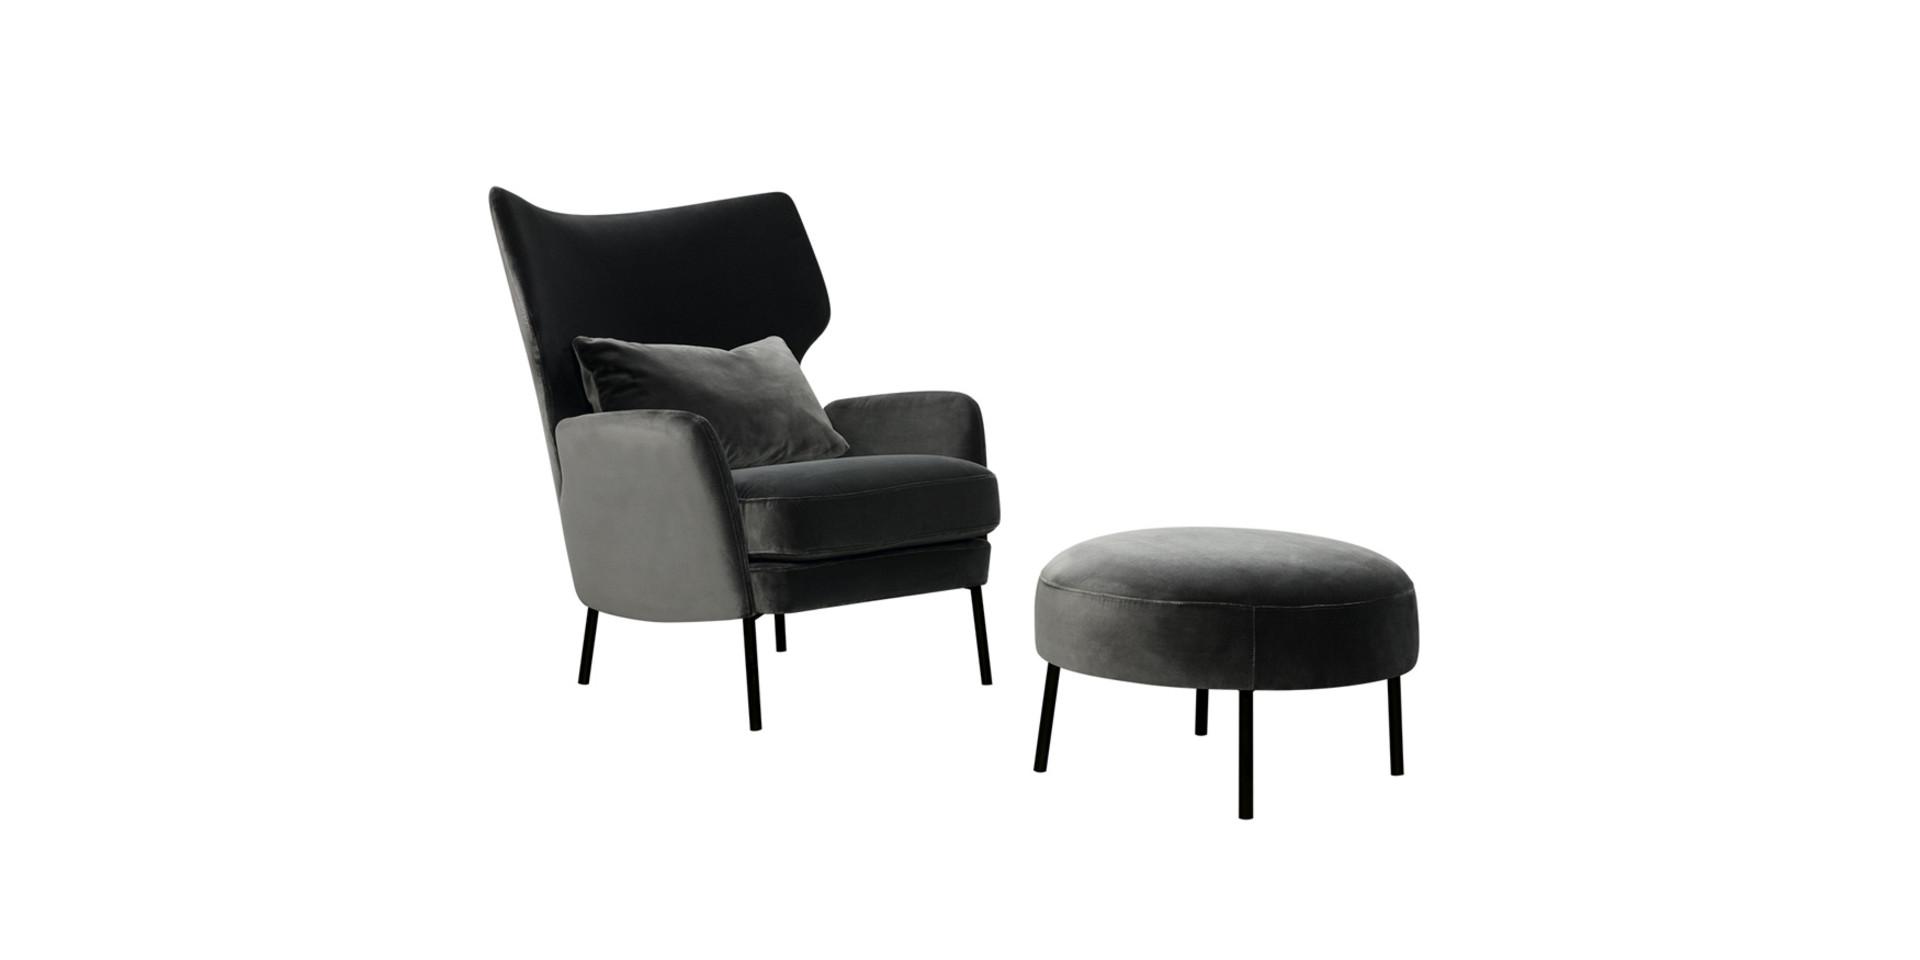 ALEX_armchair_footstool_lario1404_antracite_3